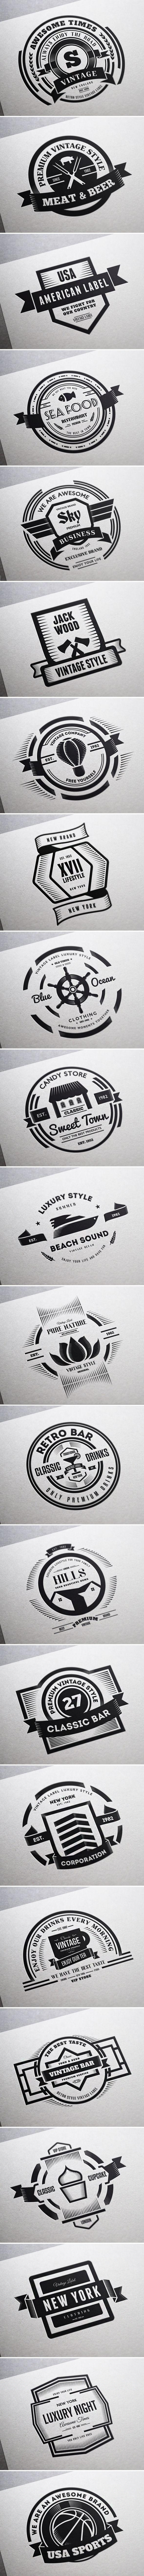 22 Vintage Labels & Badges / Logos / Insignias by Think Big Design, via Behance